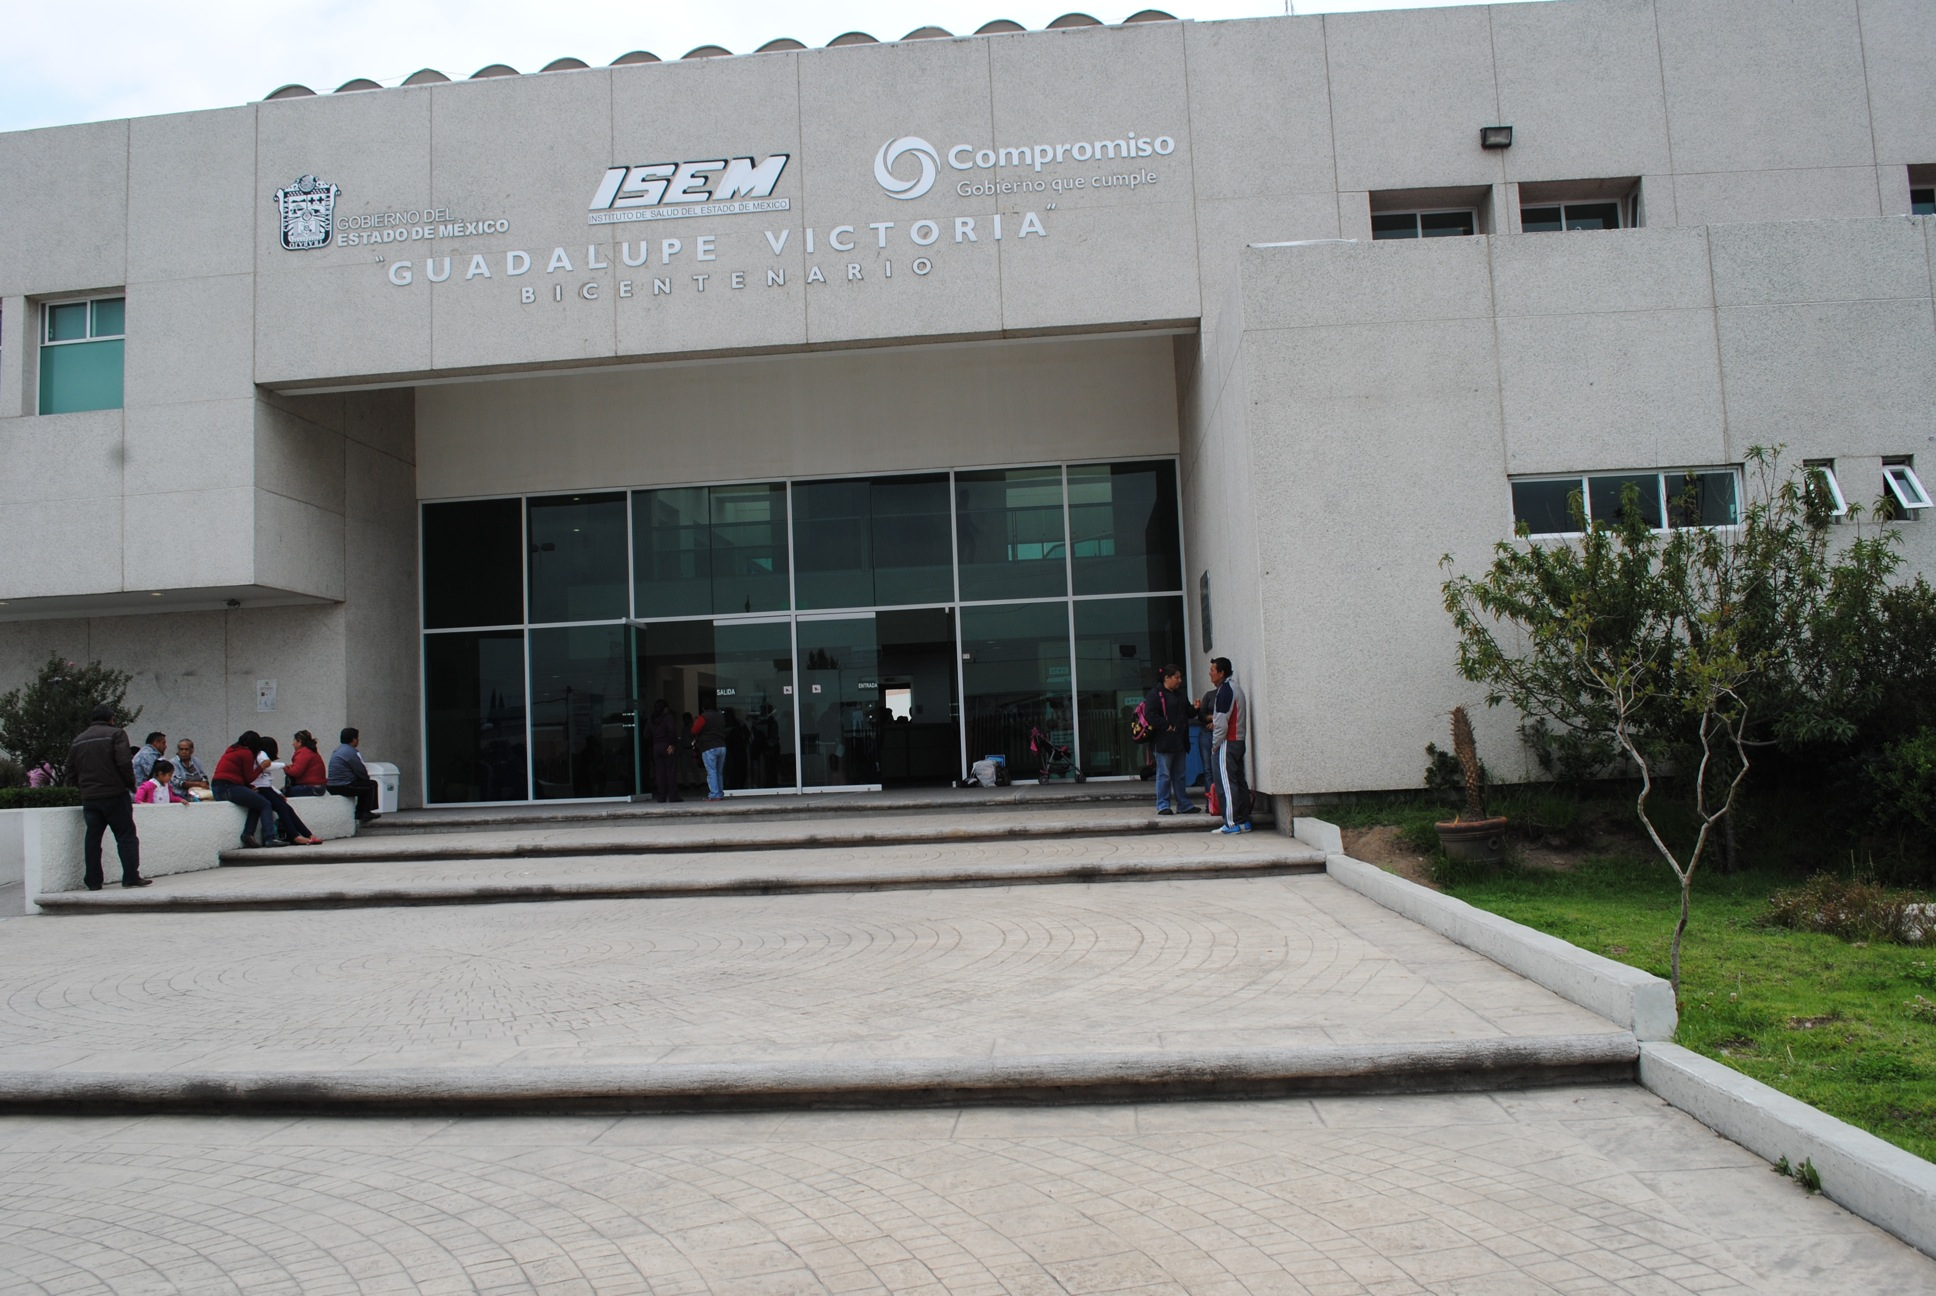 hospital-guadalupe-victoria-texcoco-isem